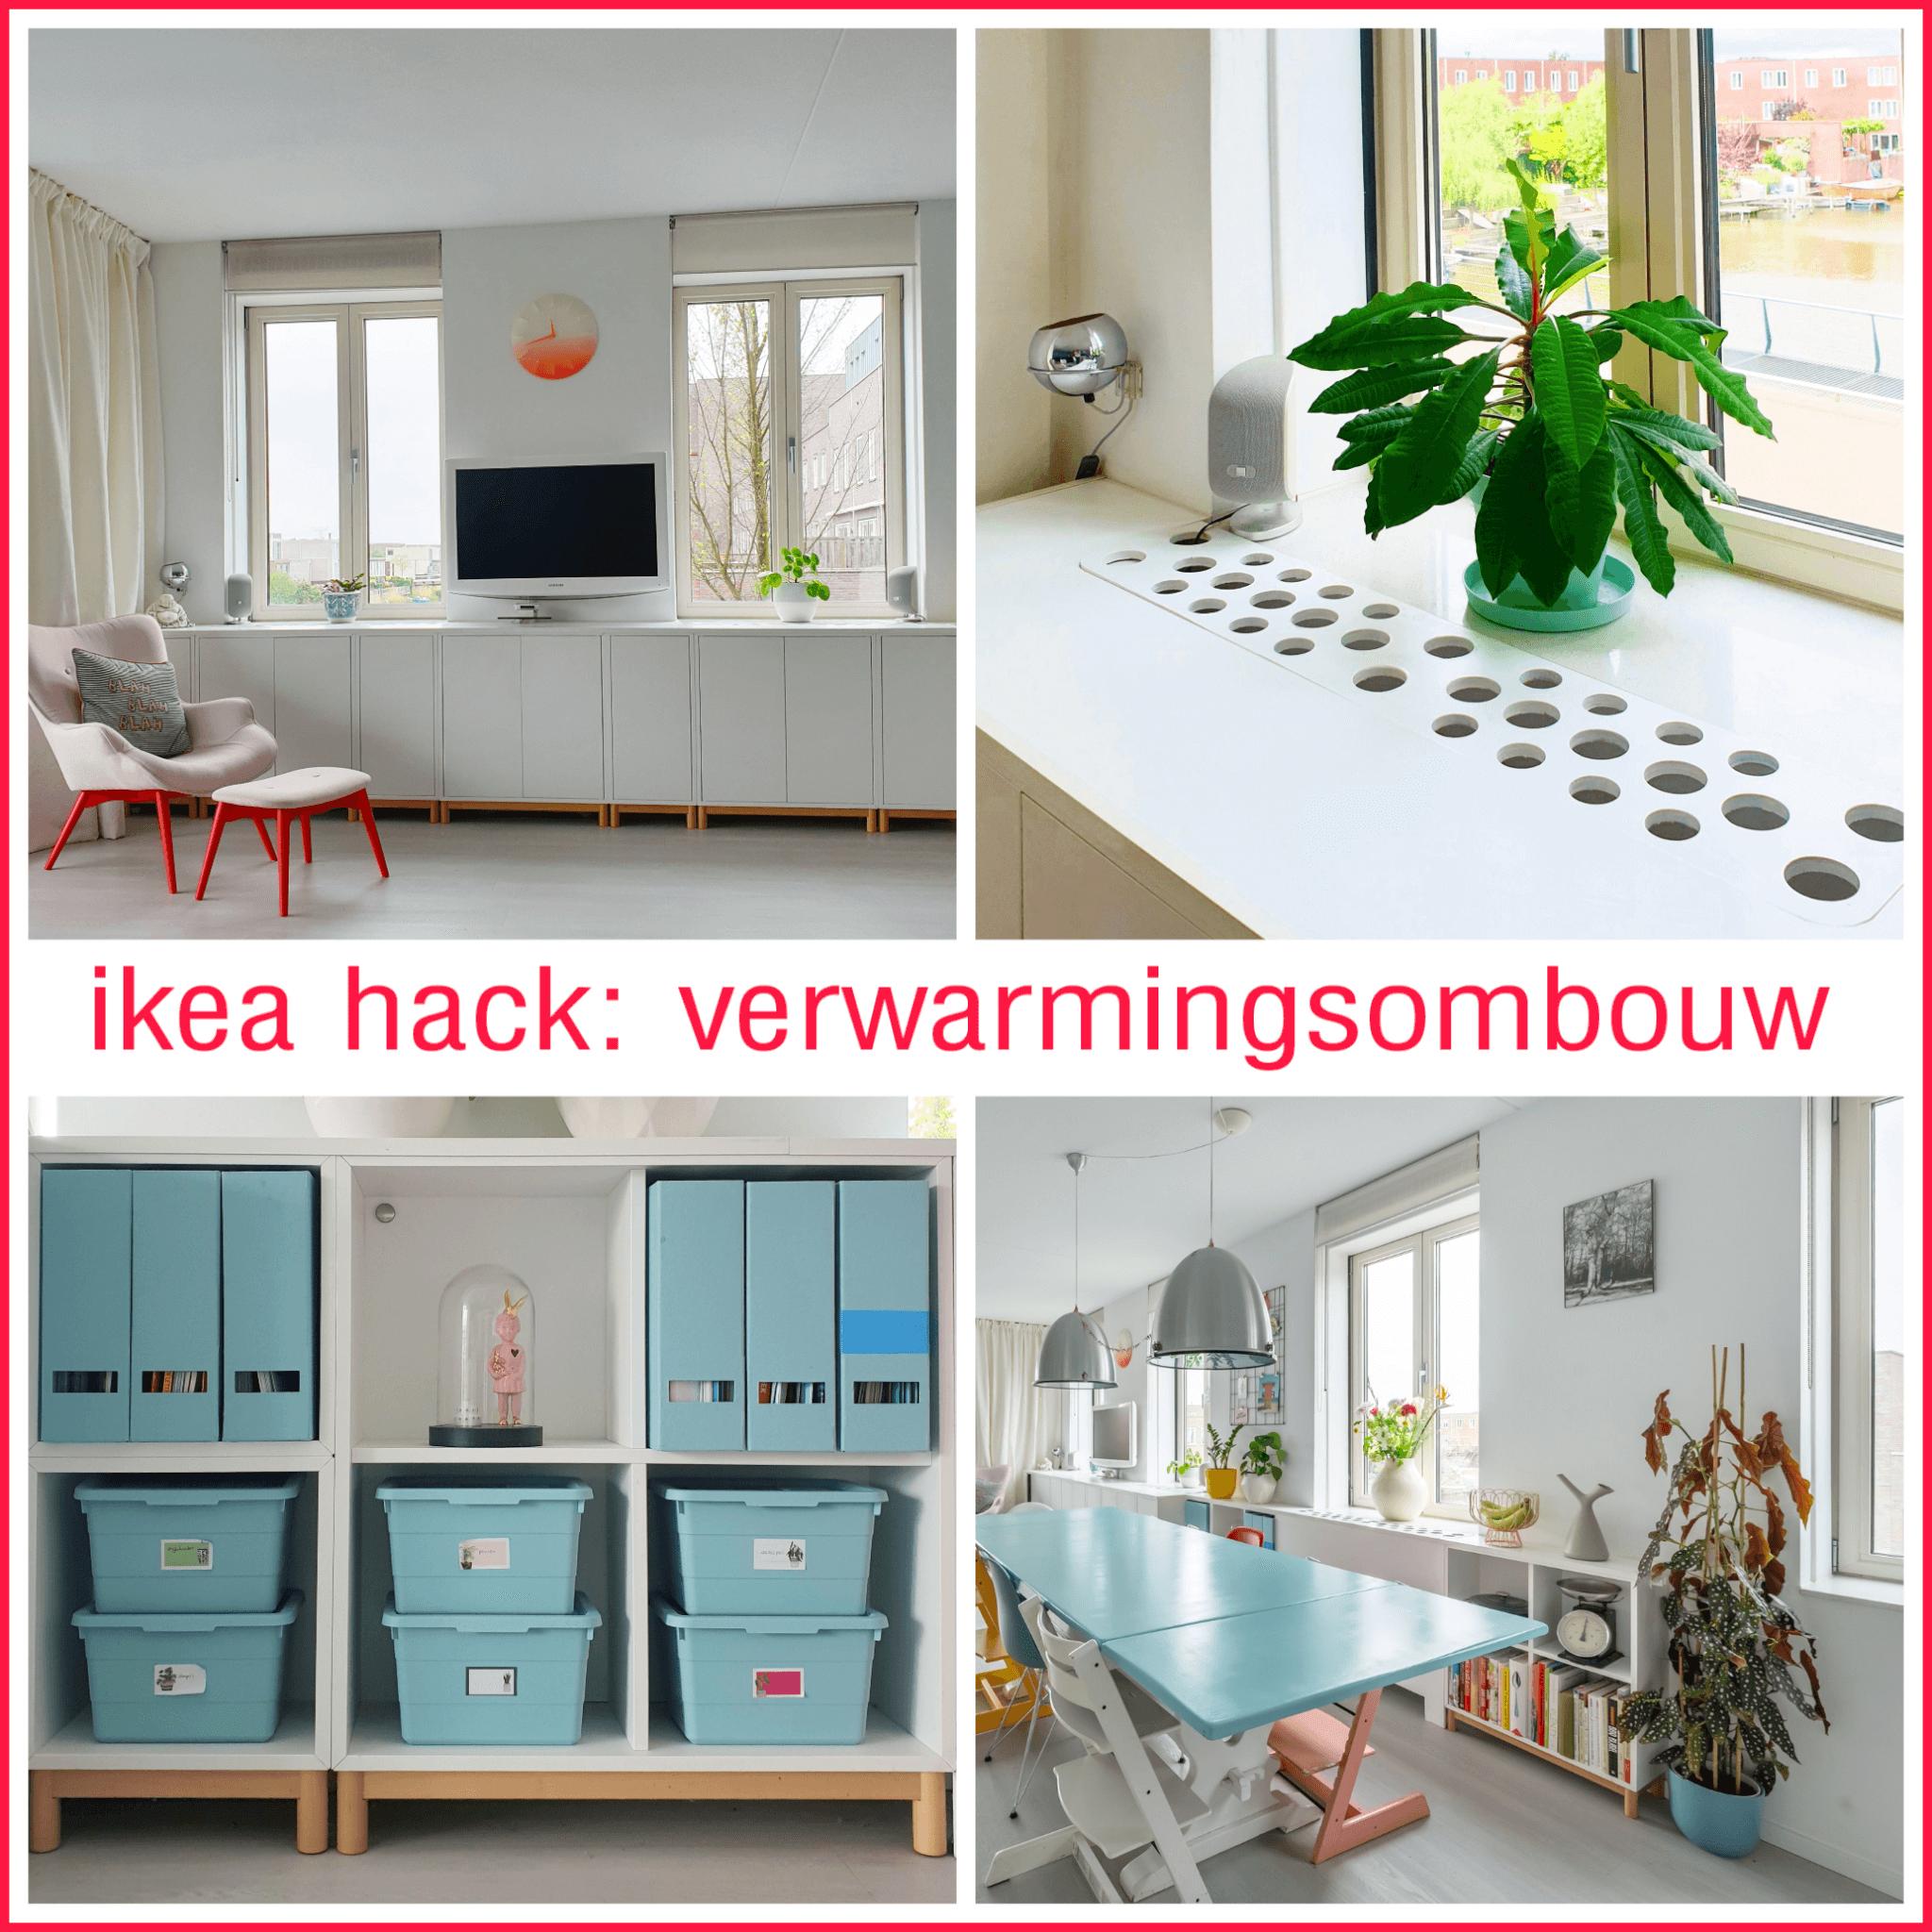 Ikea Hack: Eket verwarmingsombouw en dressoir. Eket heating conversion and sideboard dresser cupboard